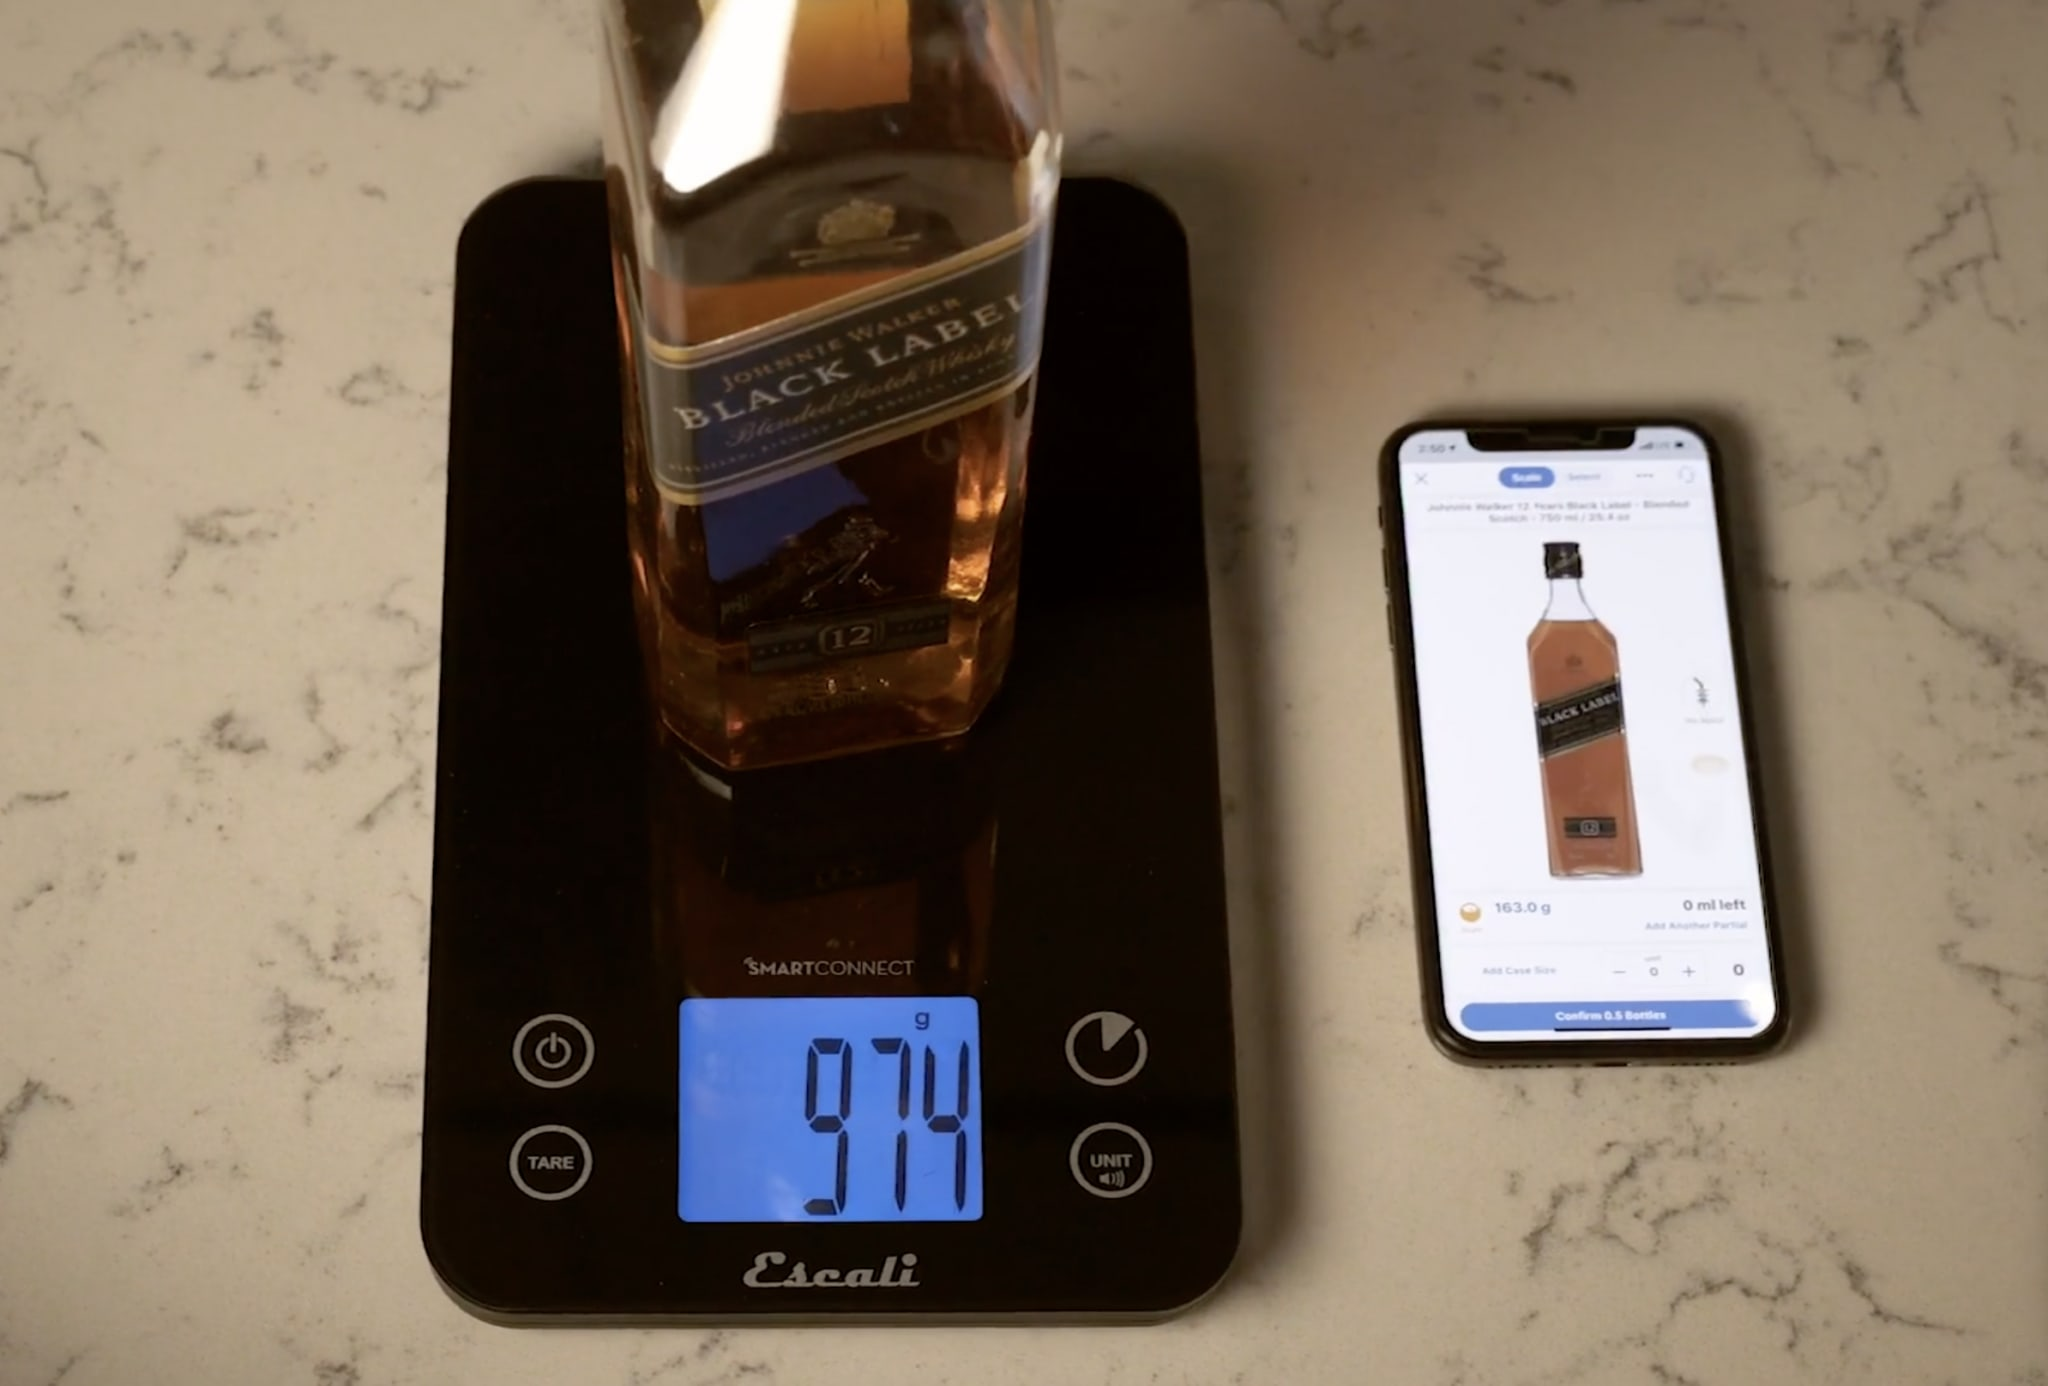 liquor bottle, iphone, scale, liquor inventory scale, wisk